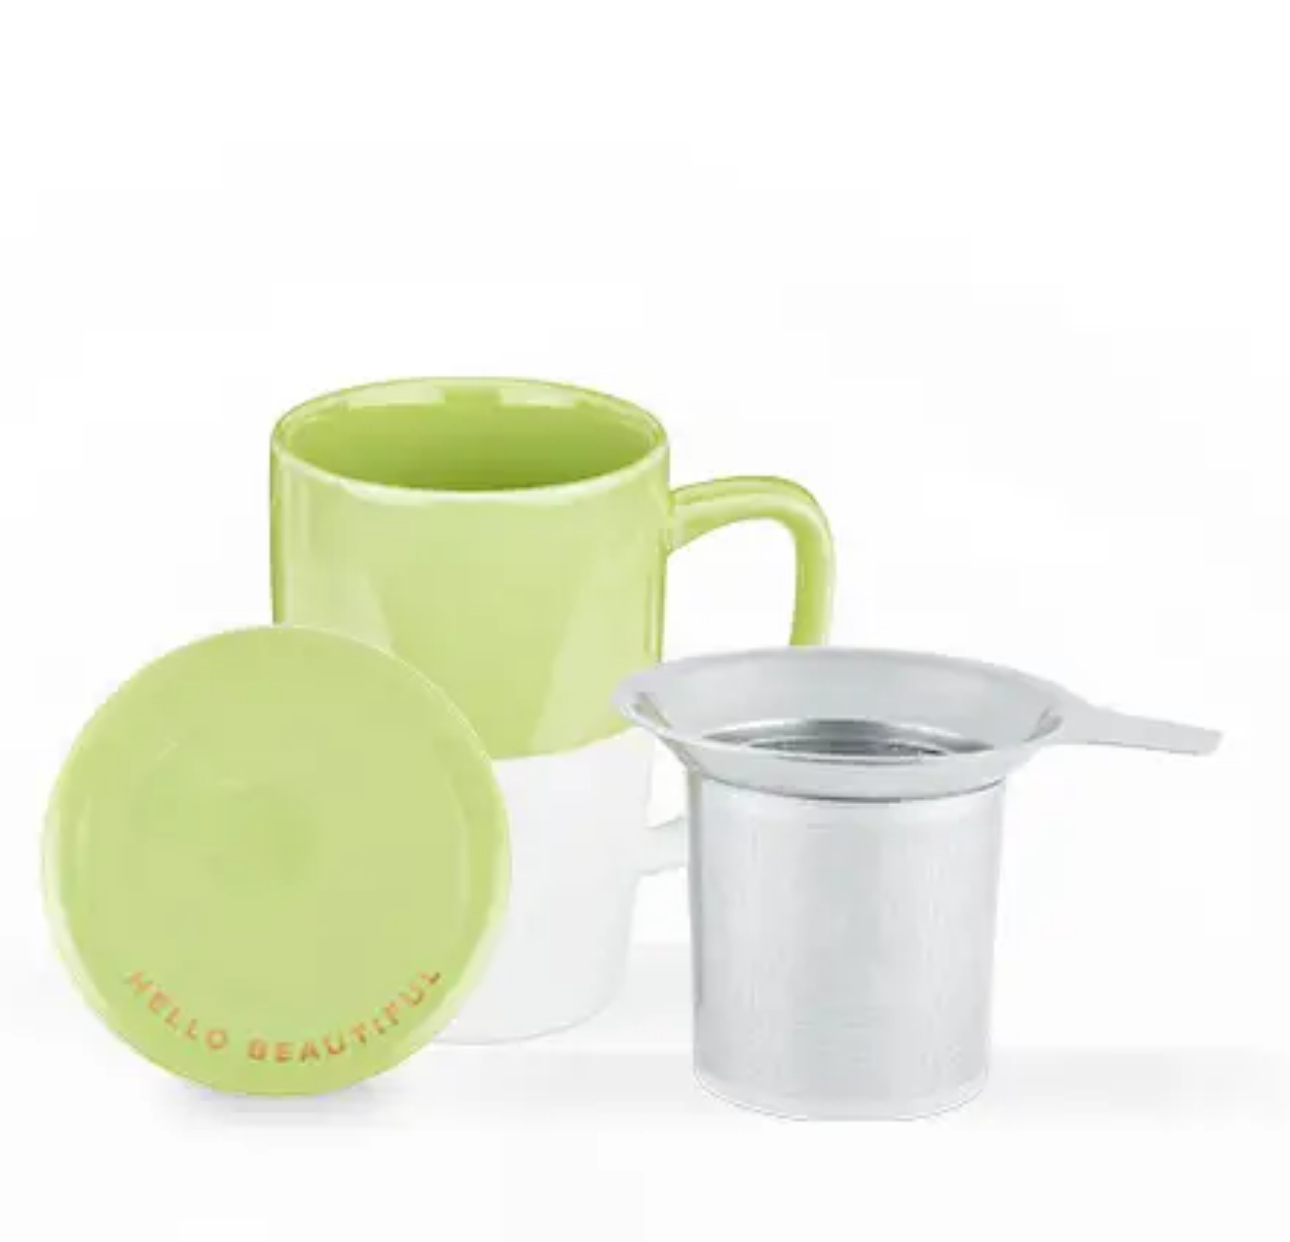 Pinky Up Delia Green Tea Mug & Infuser